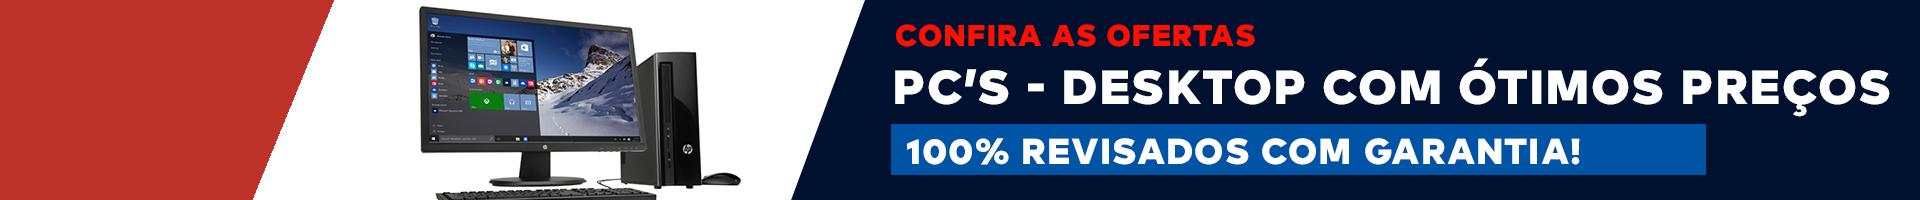 catalogo-pcs-desktop